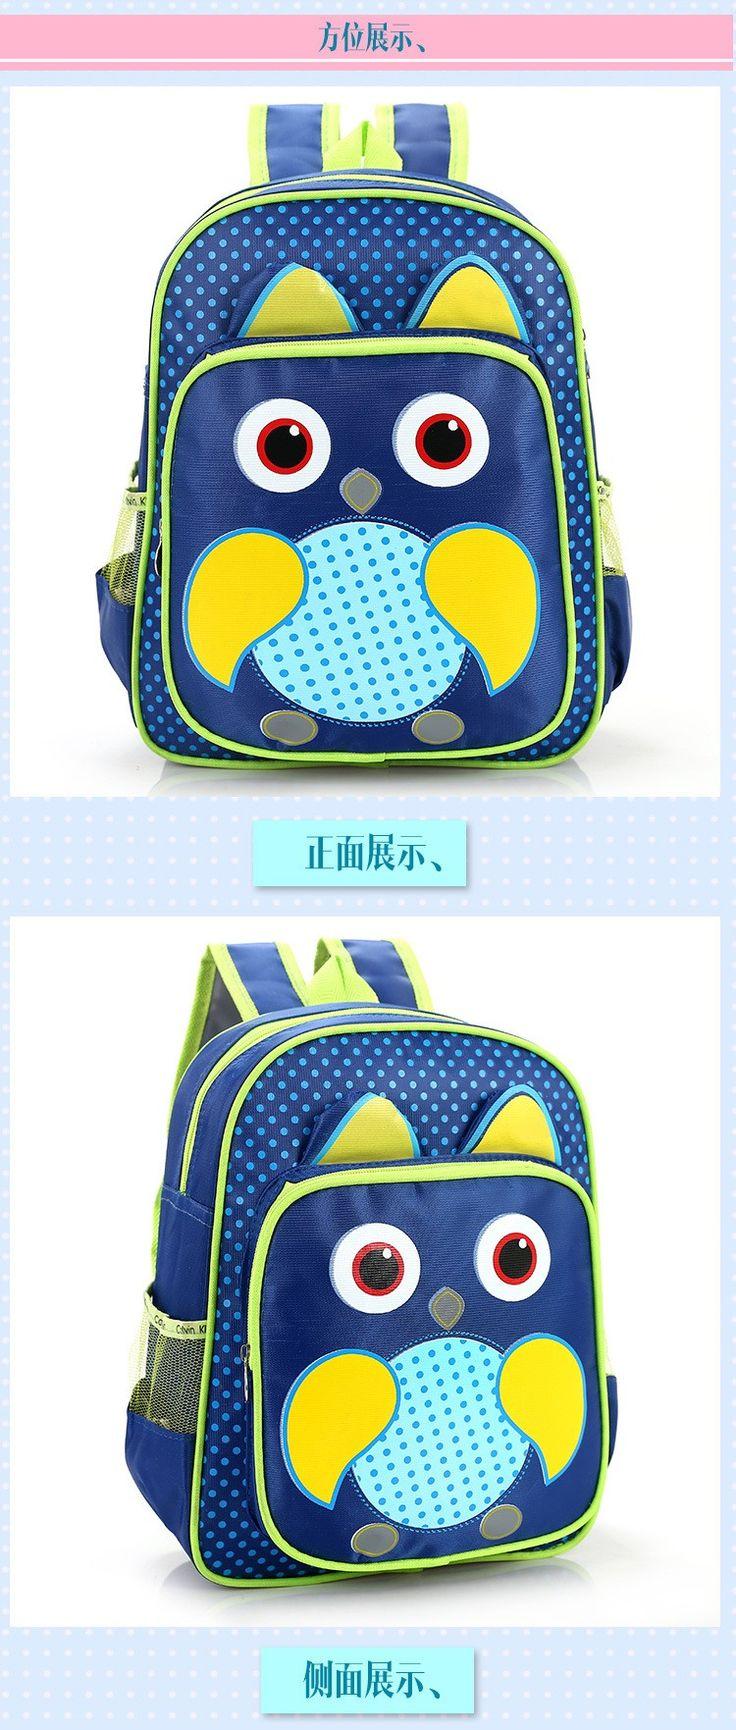 Cute Little Boys and Grils Canvas Backpack Kindergarten Kids Cartoon Animal Design School Bags